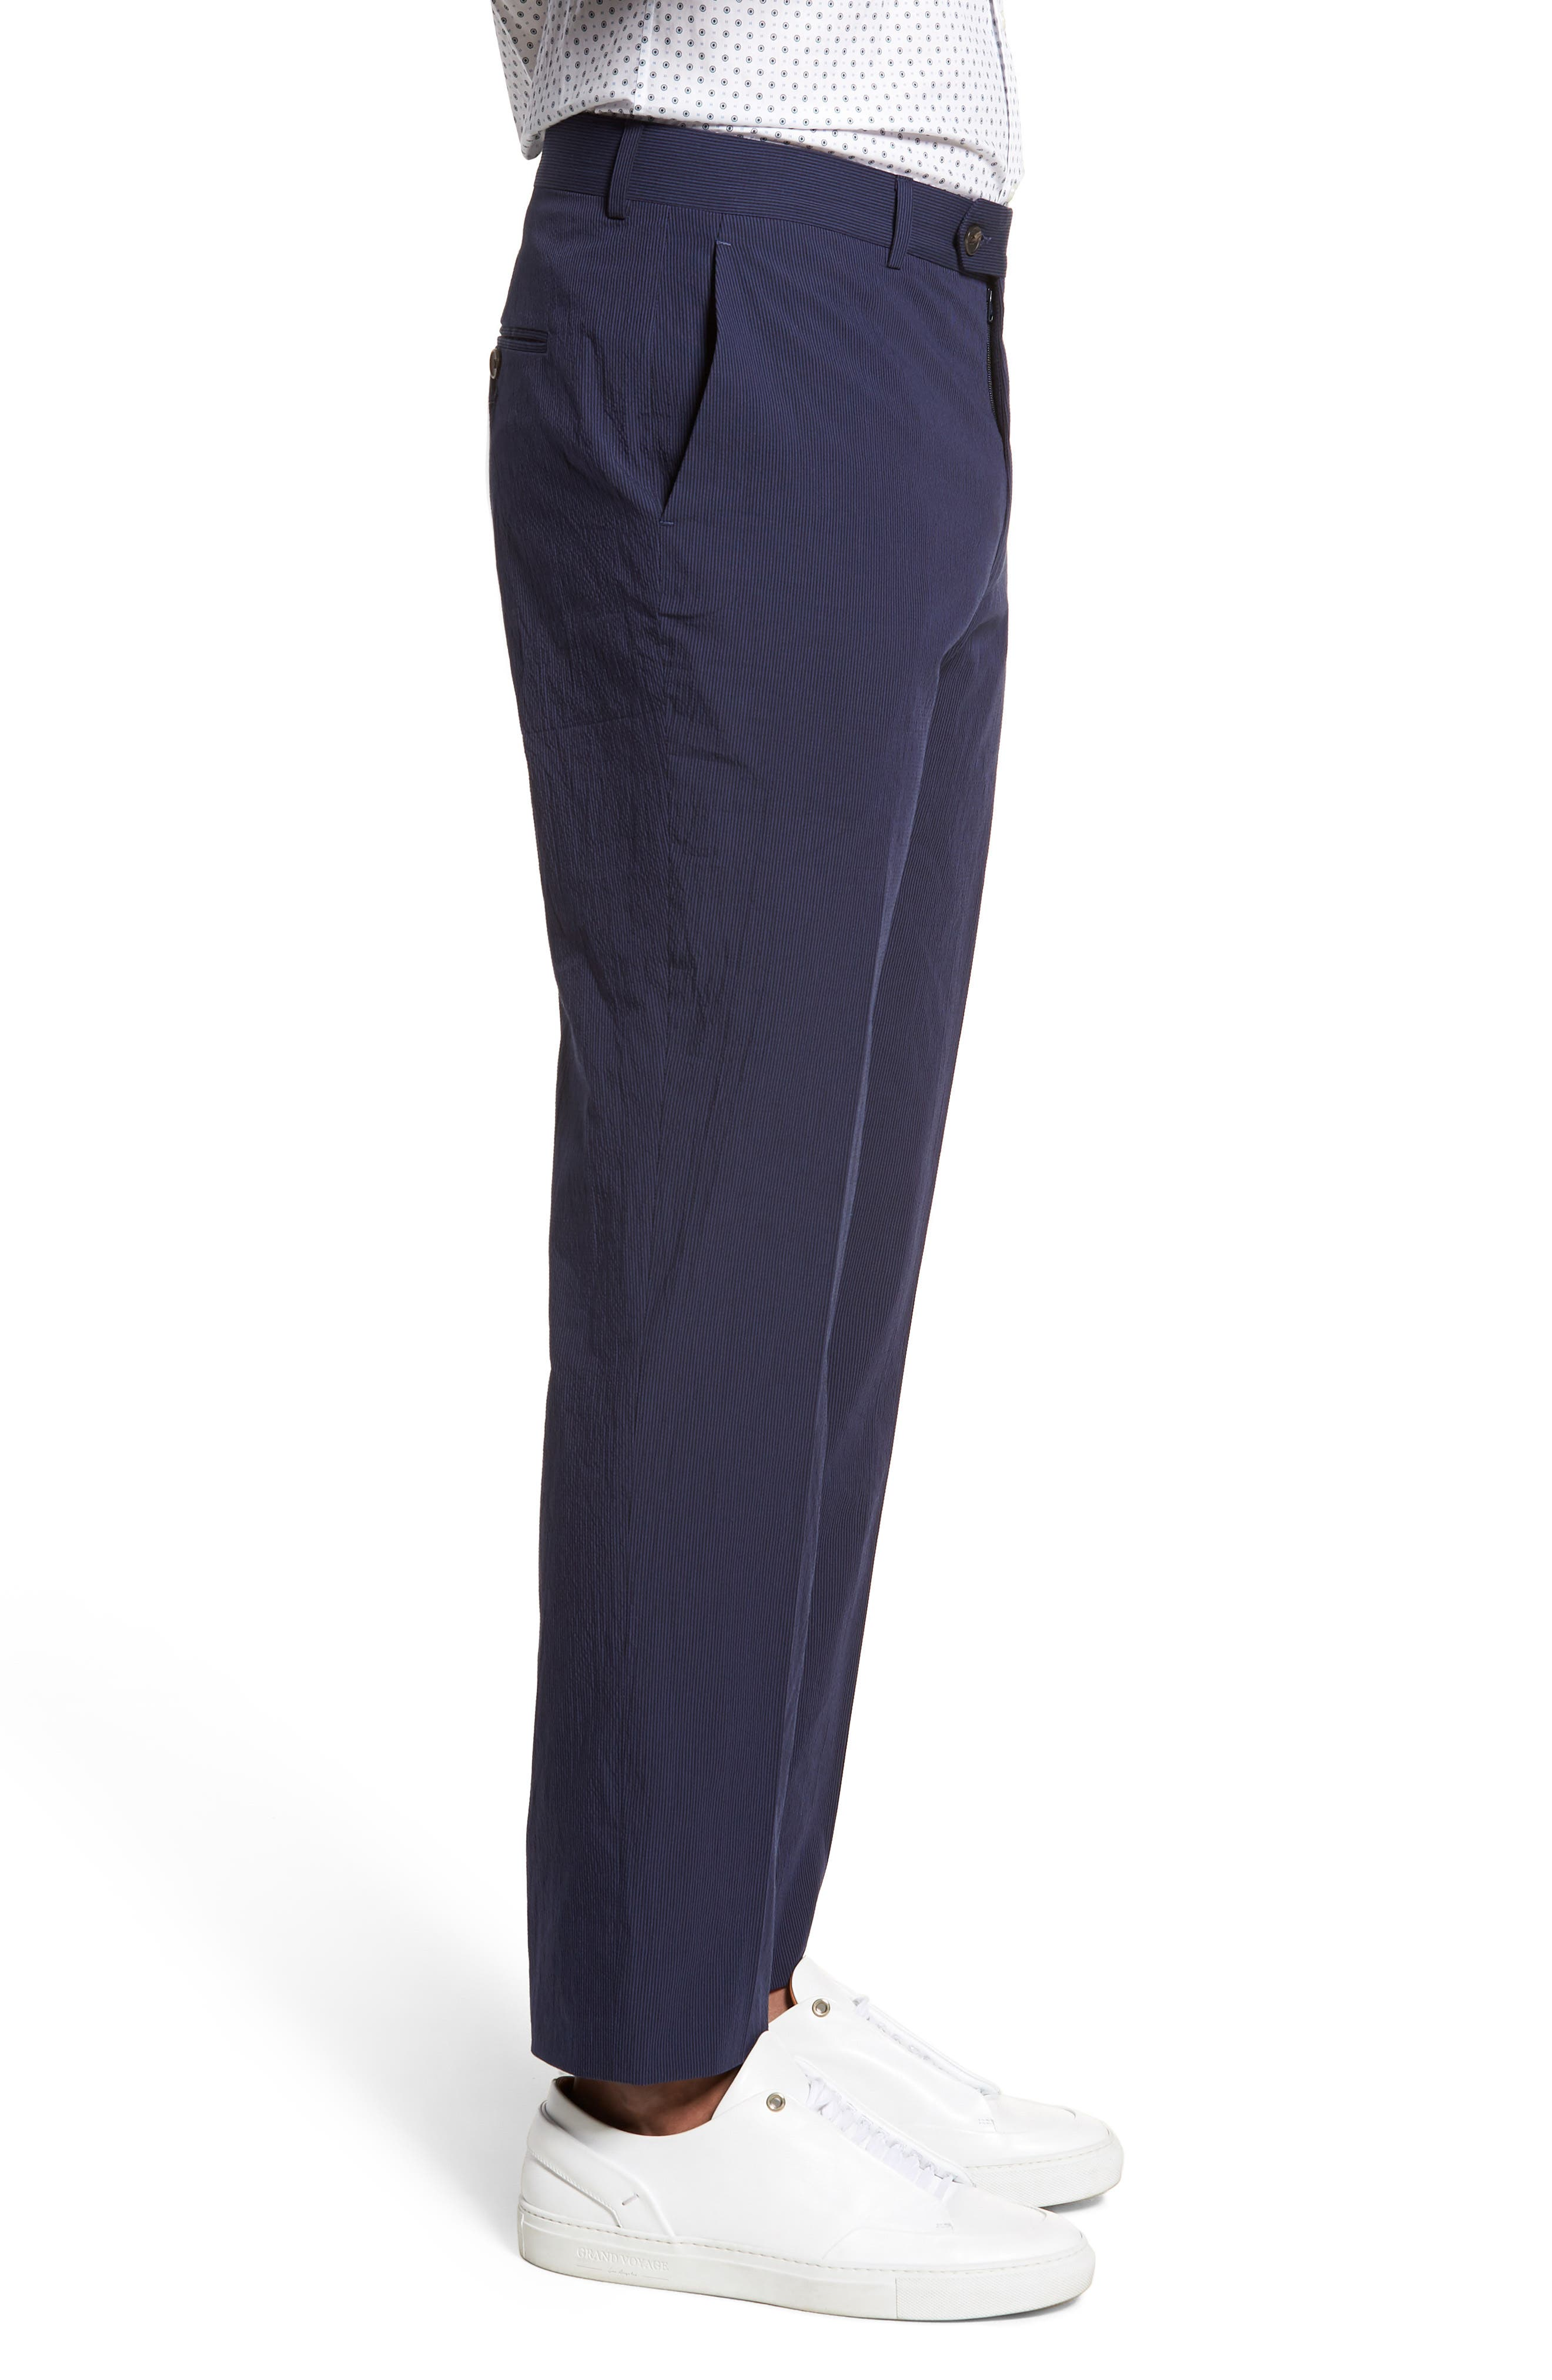 Dagger Flat Front Seersucker Trousers,                             Alternate thumbnail 3, color,                             400